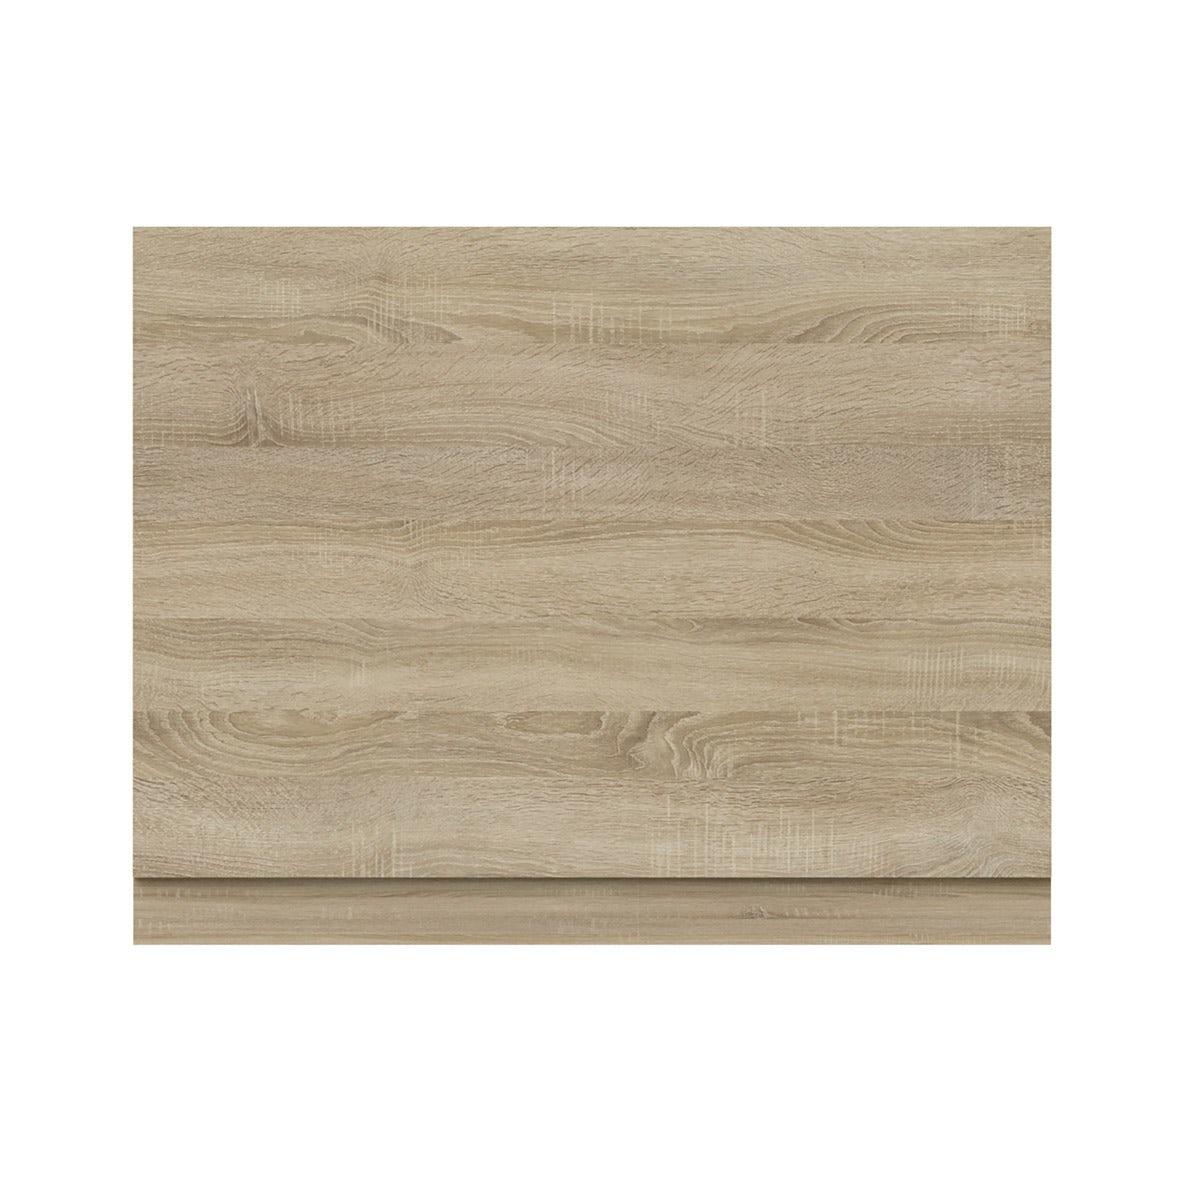 Wye oak bath end panel 680mm